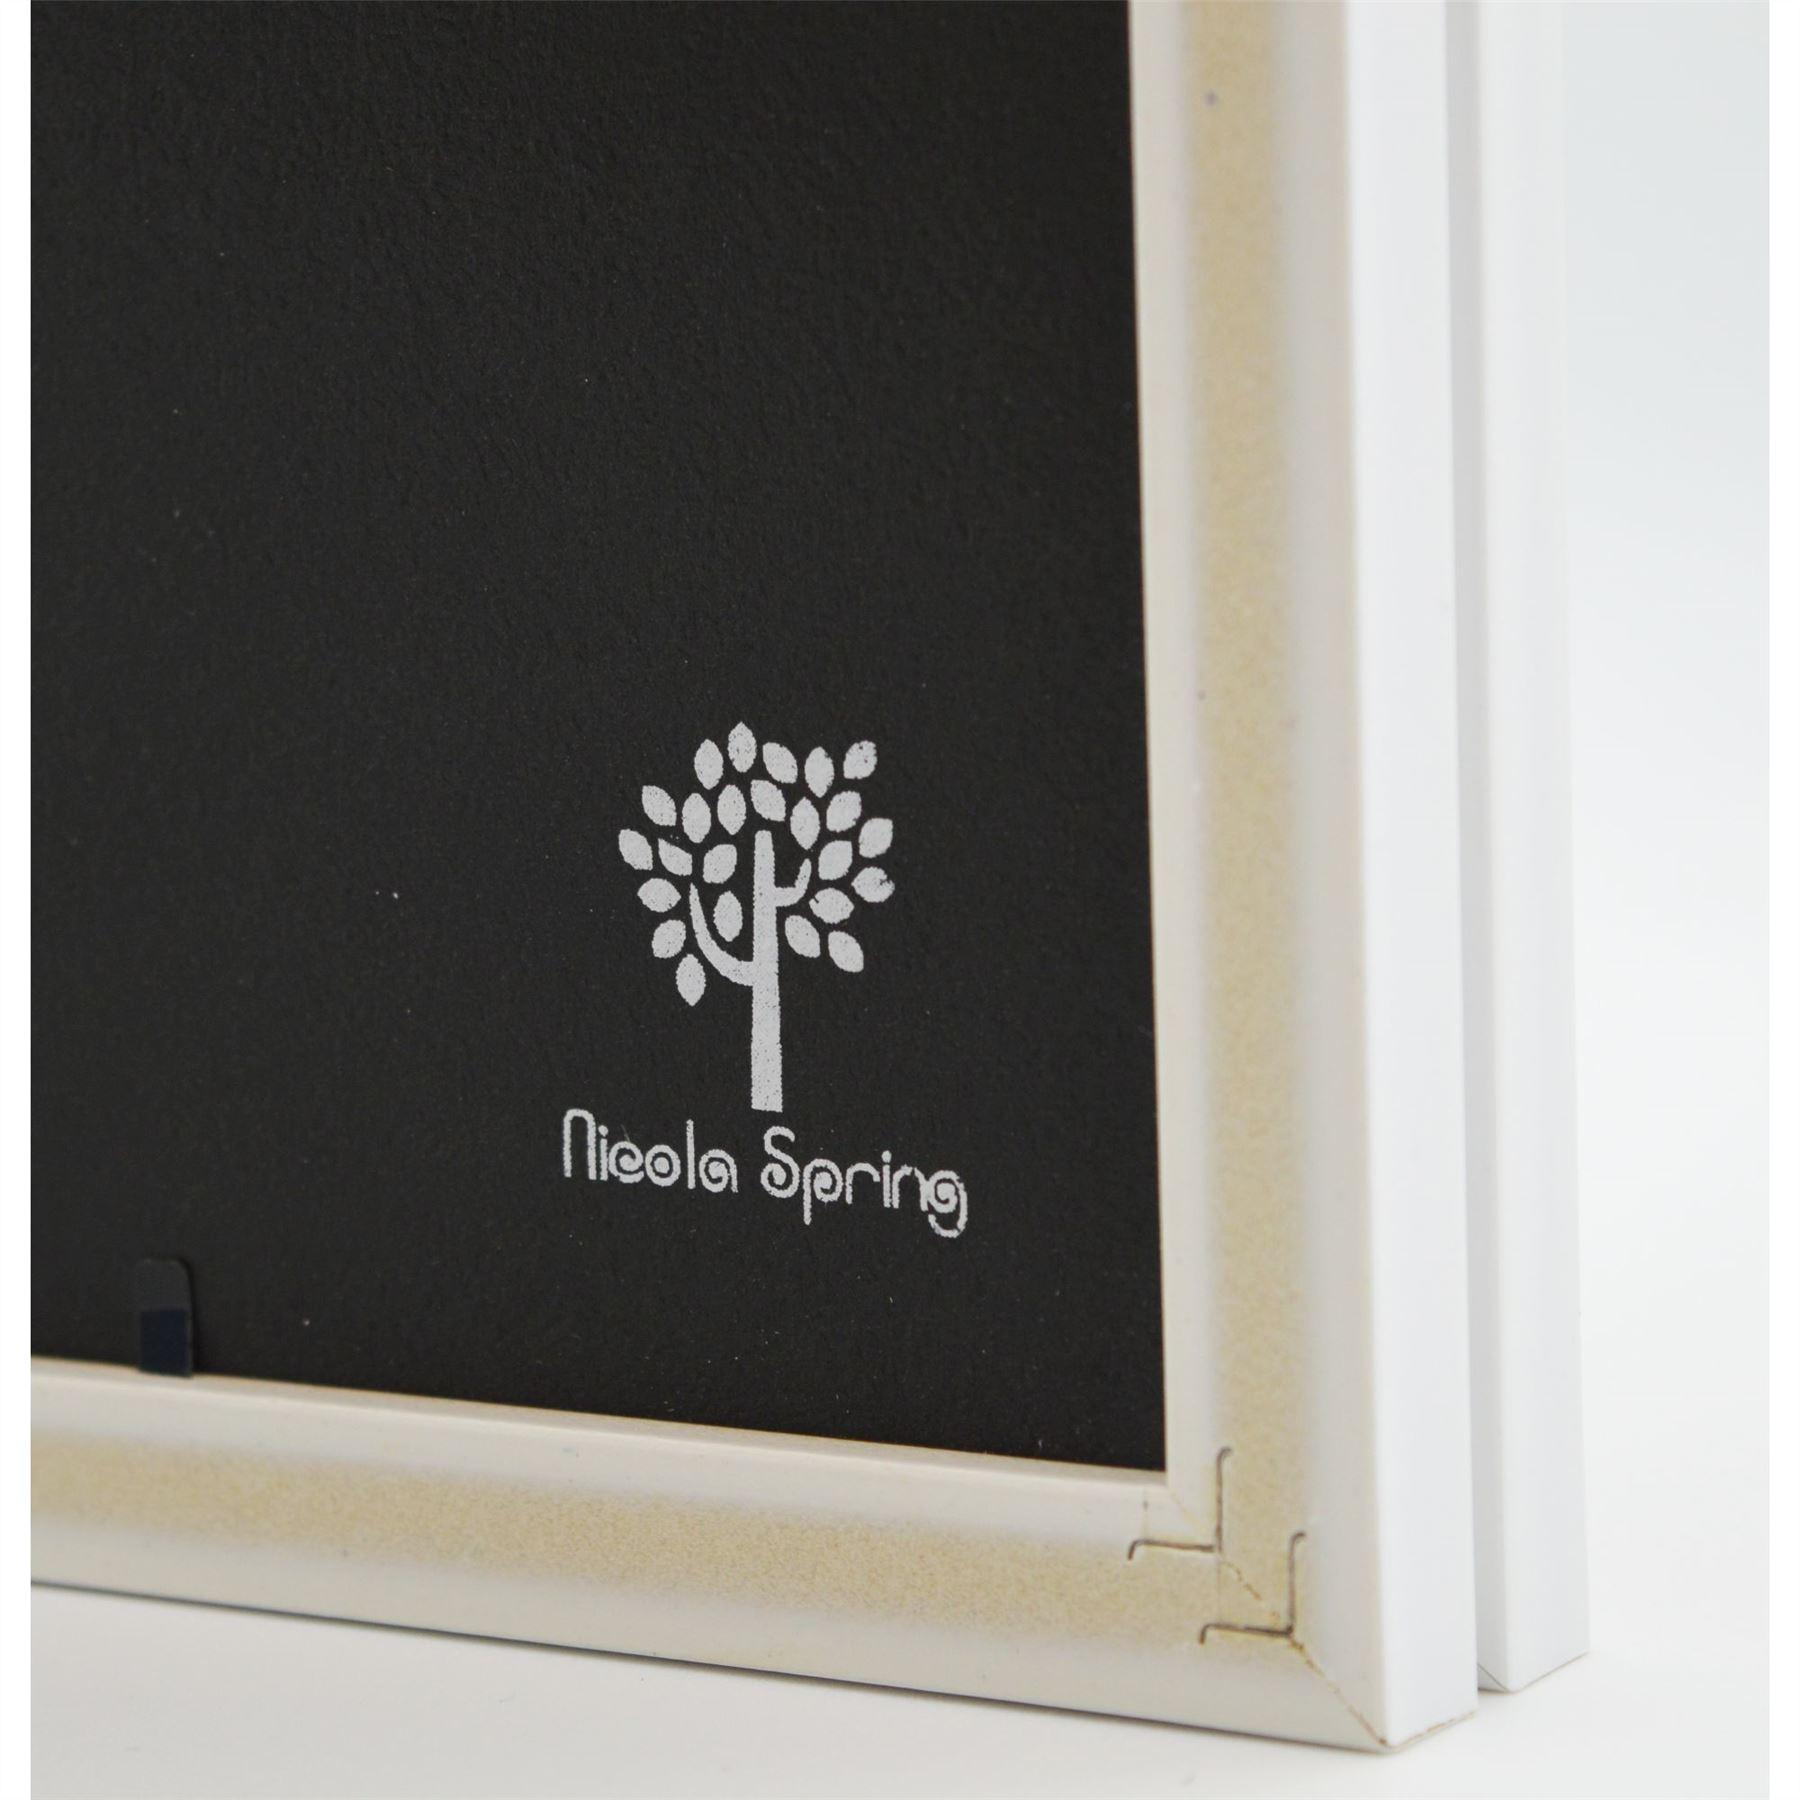 Marco plegable 5x7 Doble Fotos en Blanco - Pack de 2 | eBay